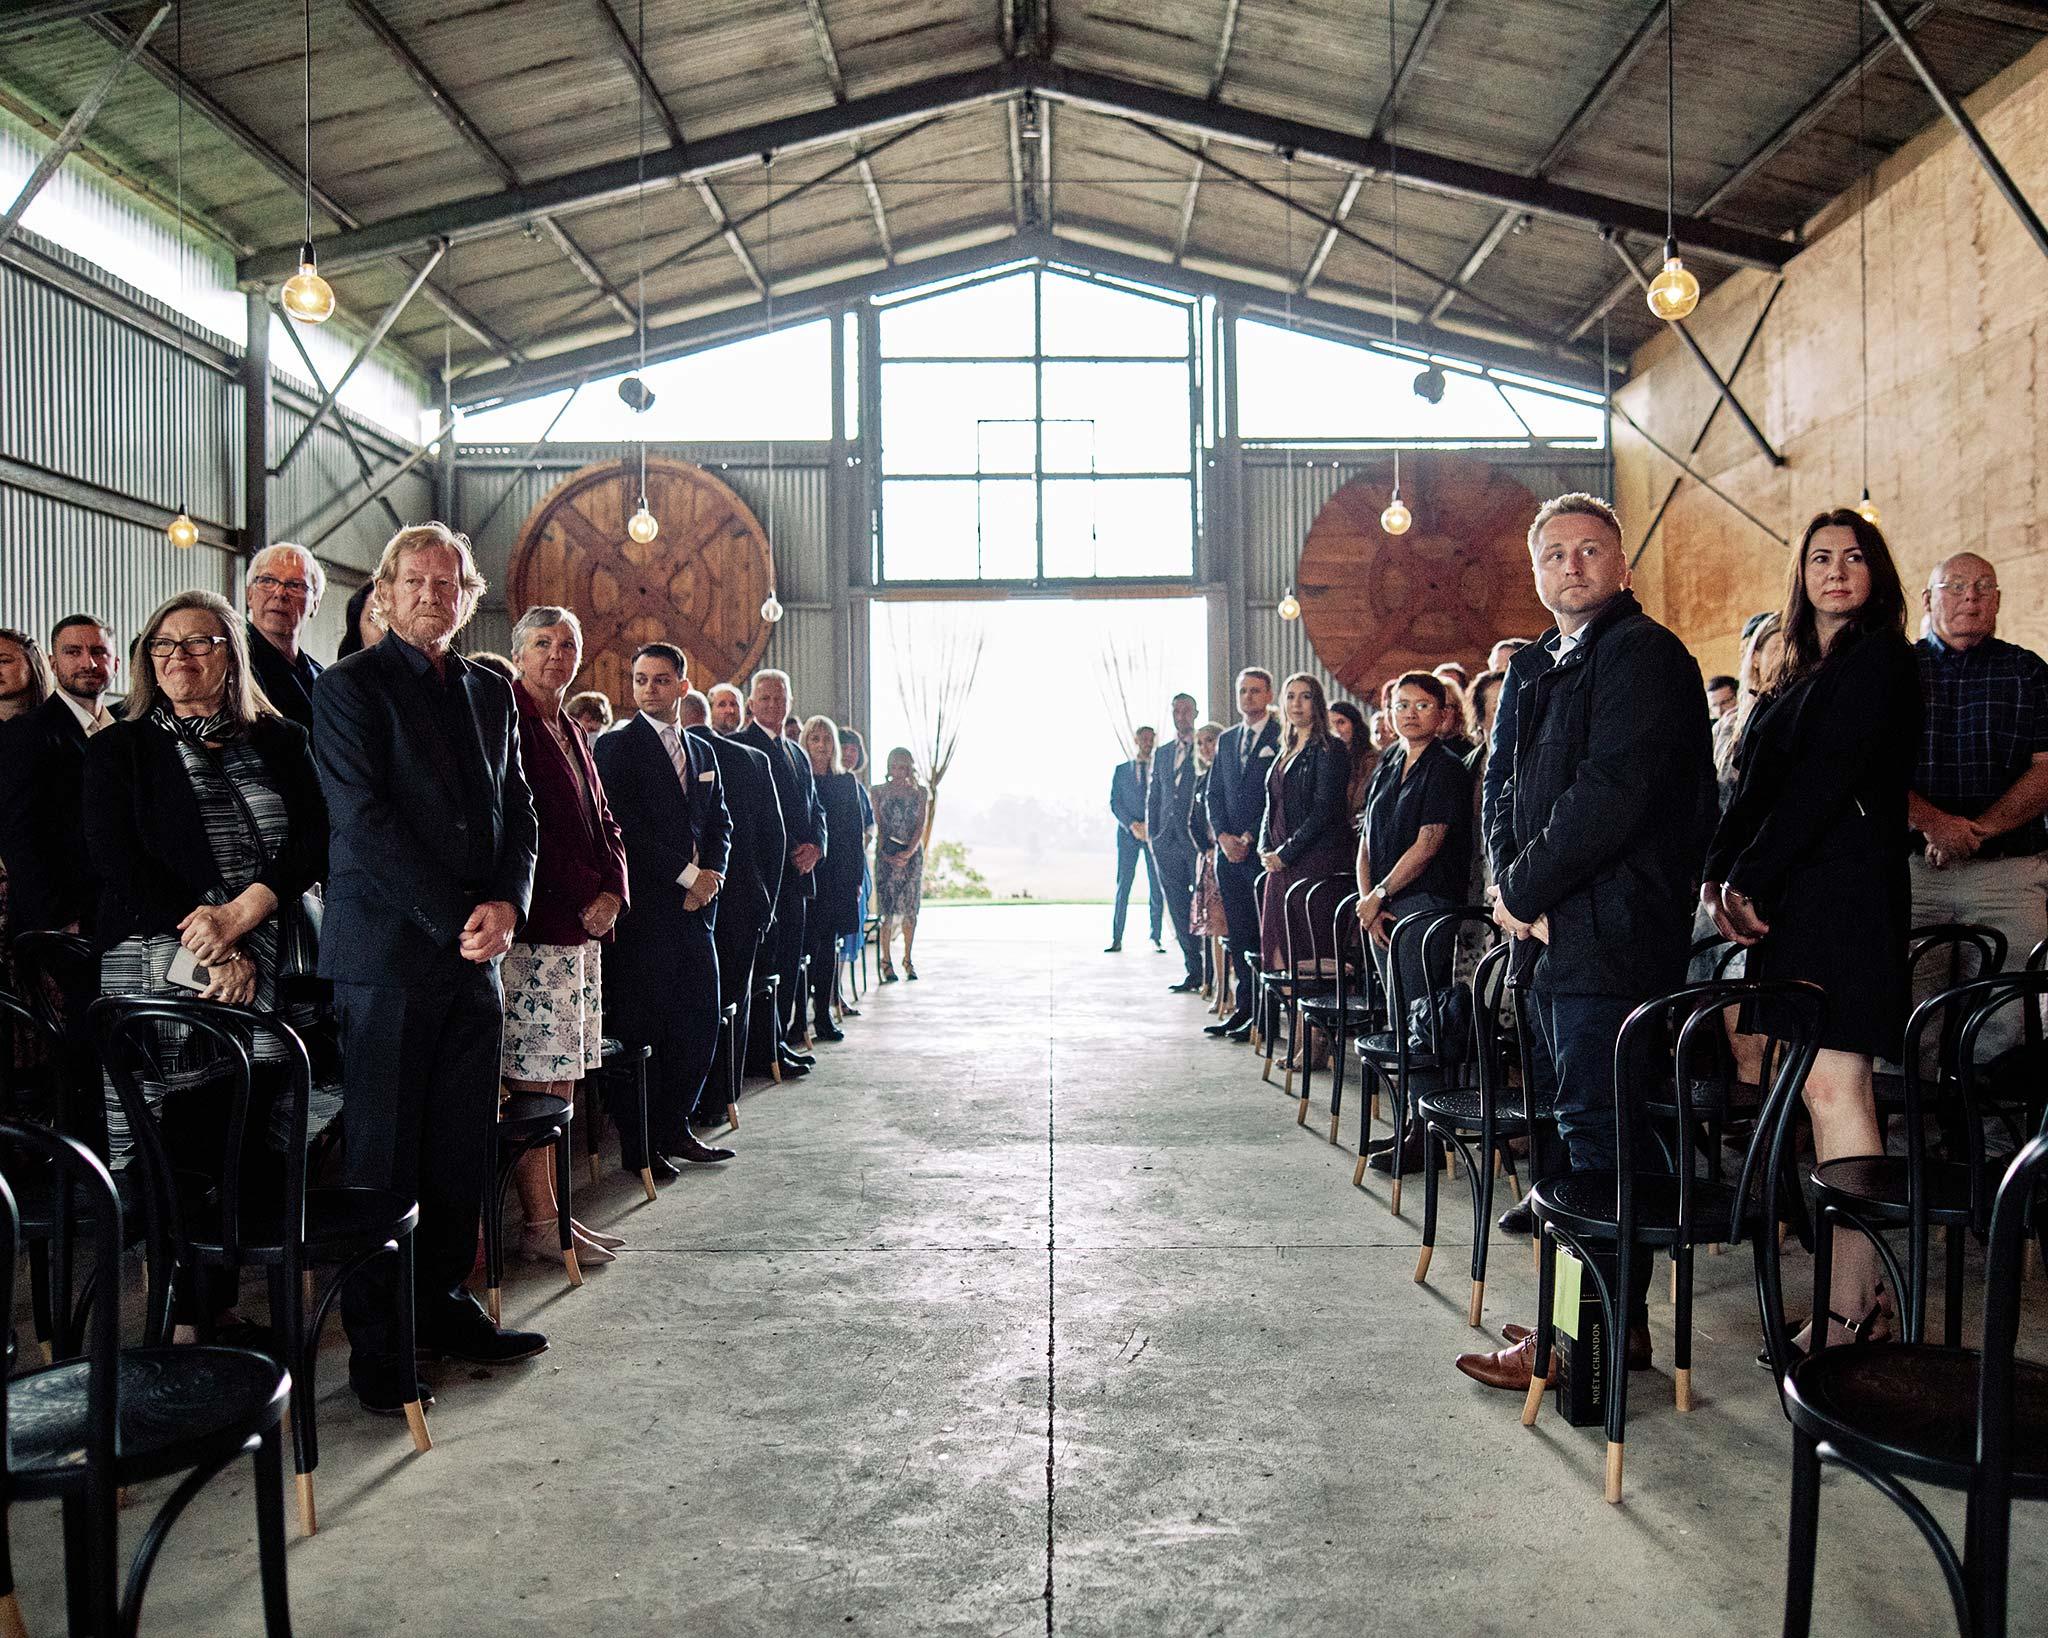 Zonzo estate wedding guests standing